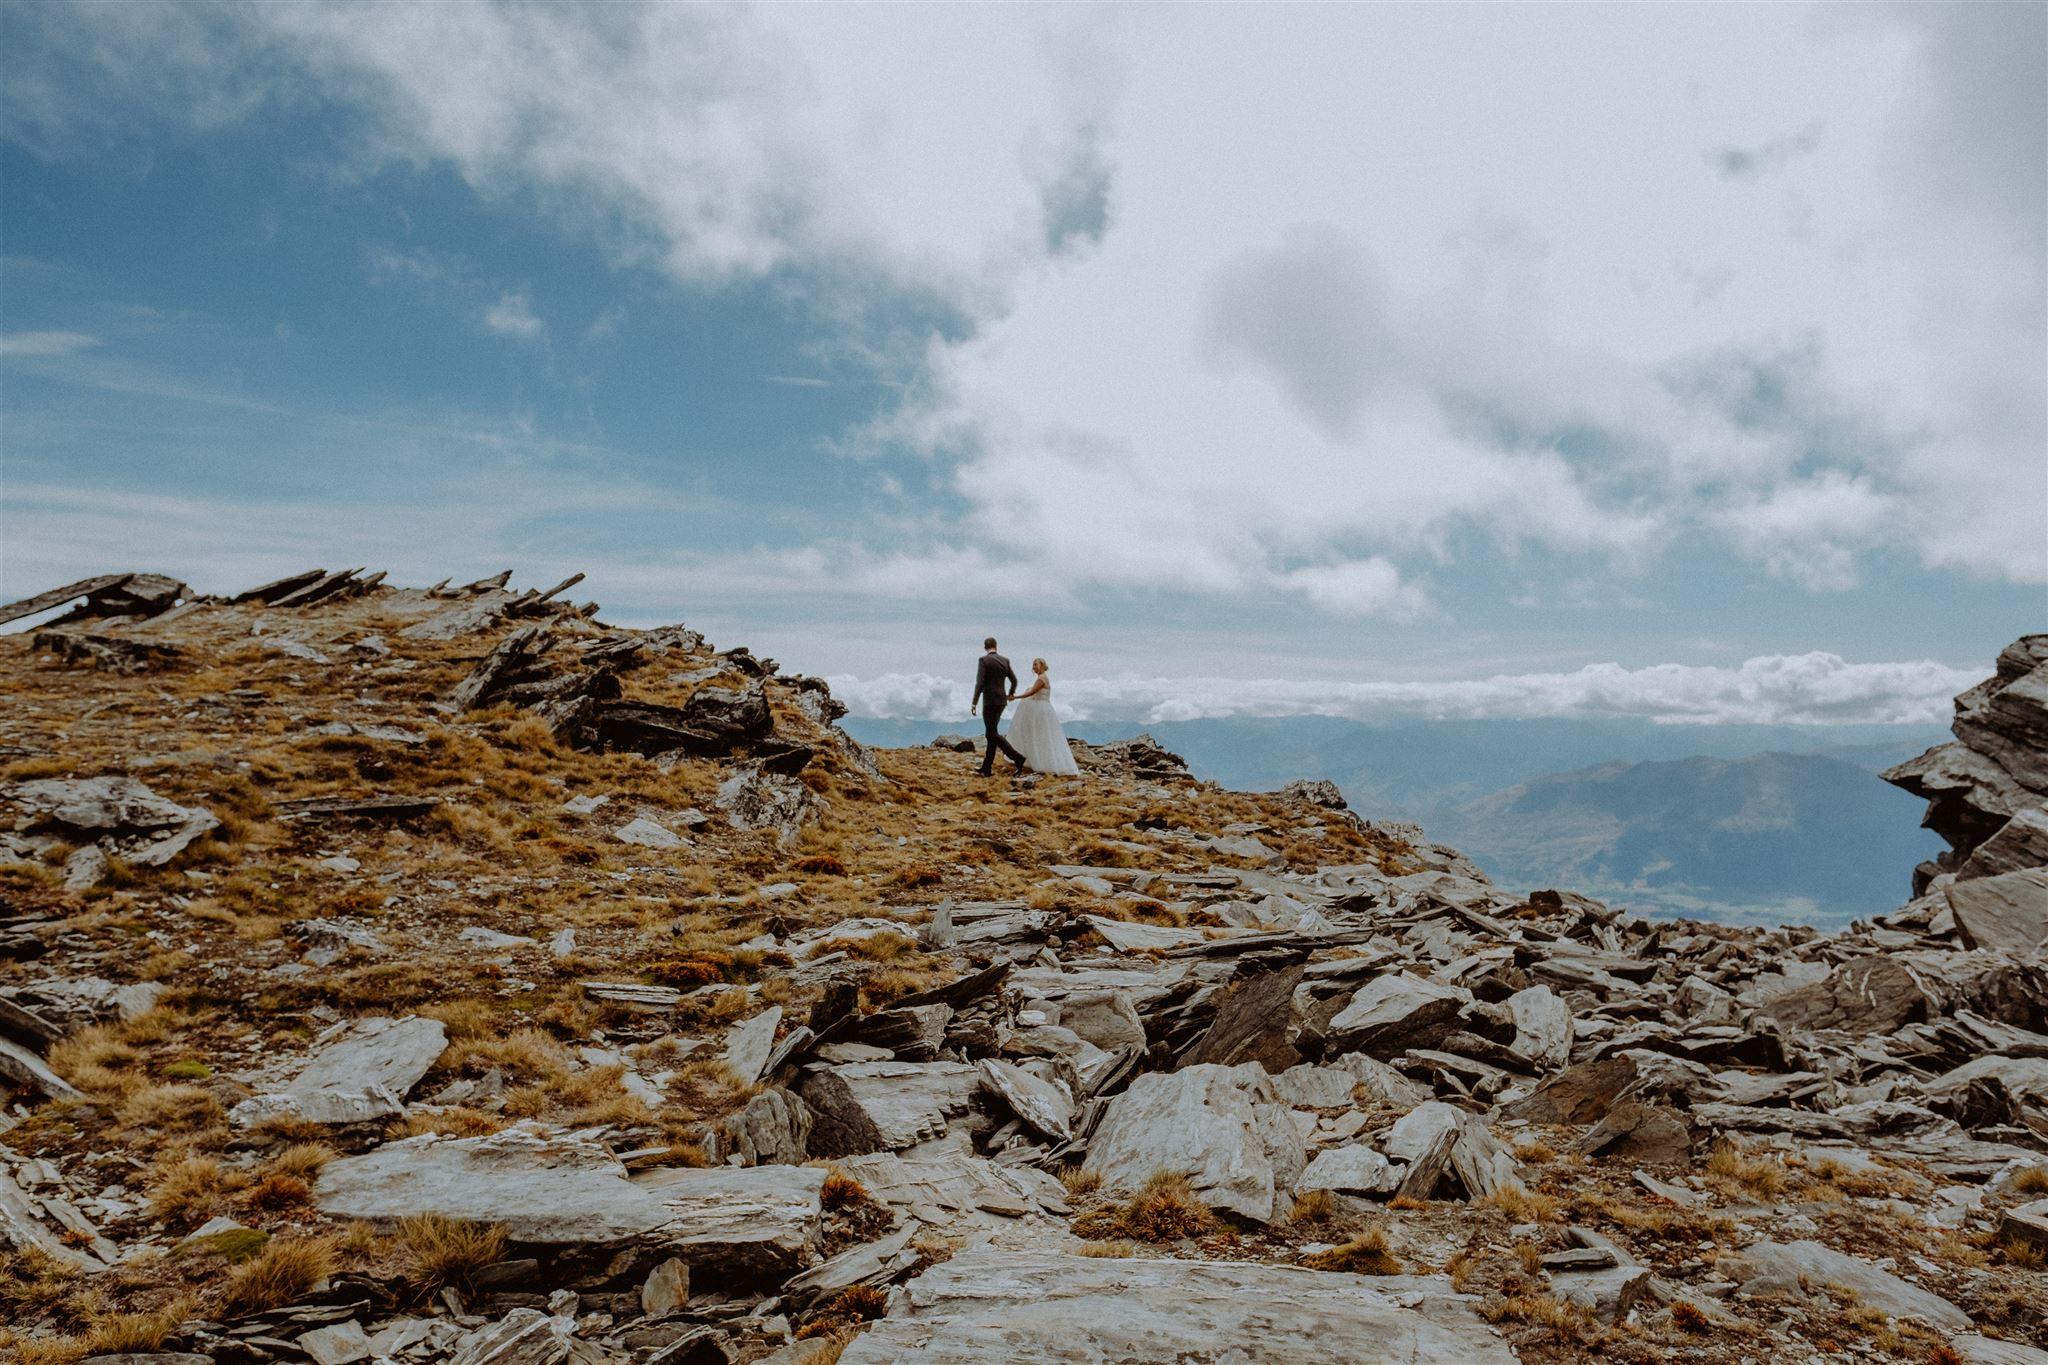 Chellise_Michael_Photography_Peregrine_New_Zealand-6436_websize.jpg